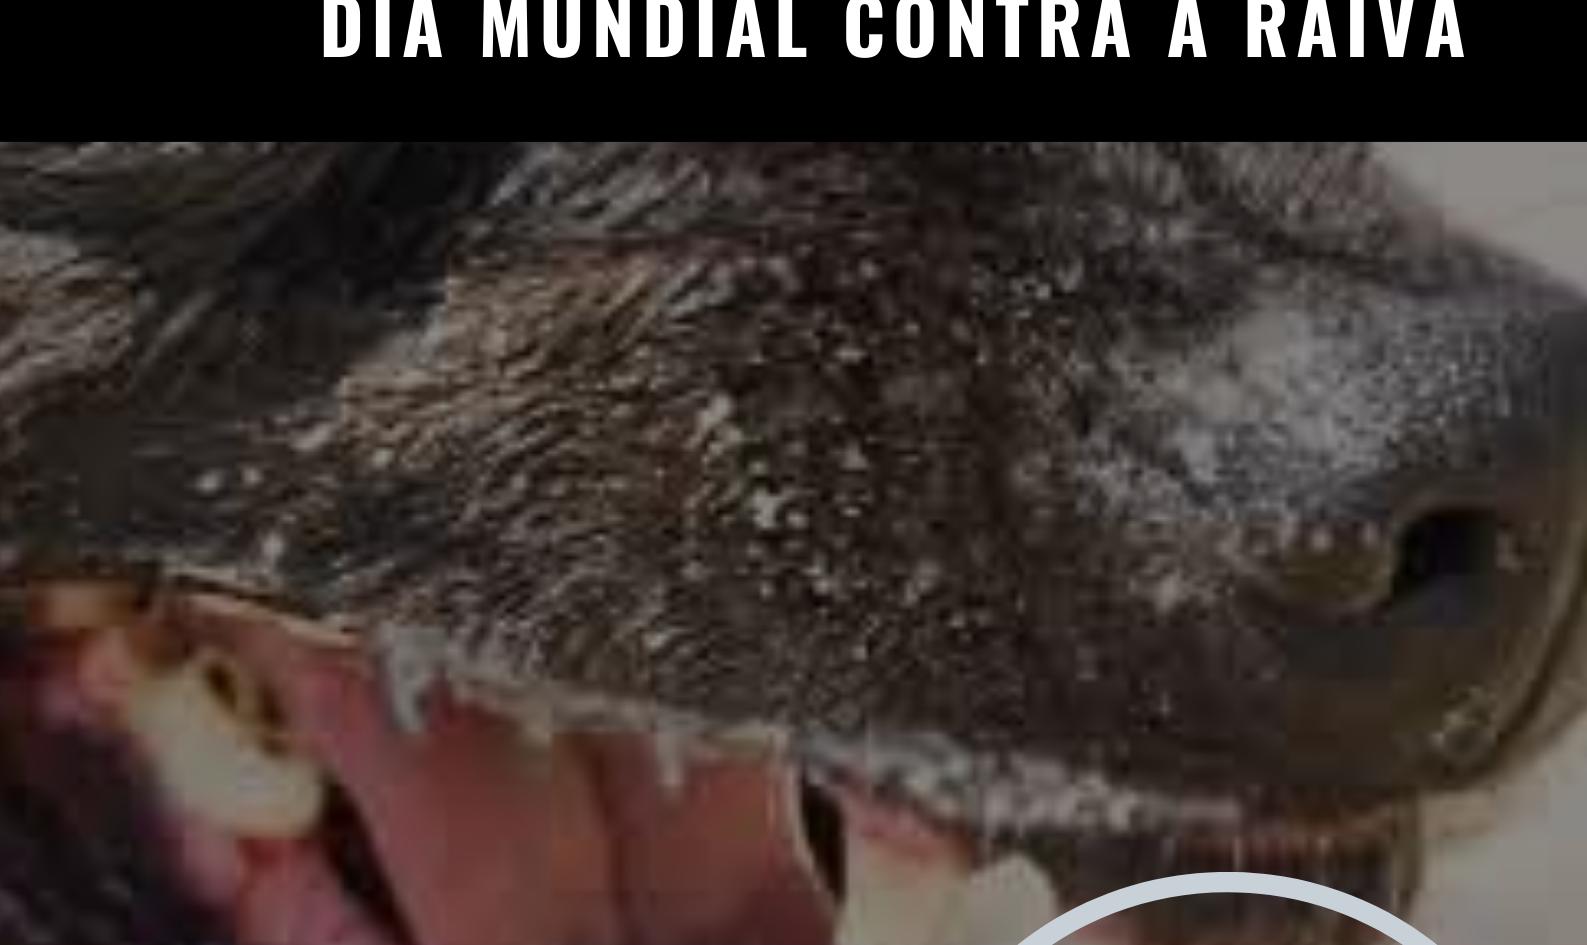 28_09 - DIA MUNDIAL CONTRA A RAIVA (2).p